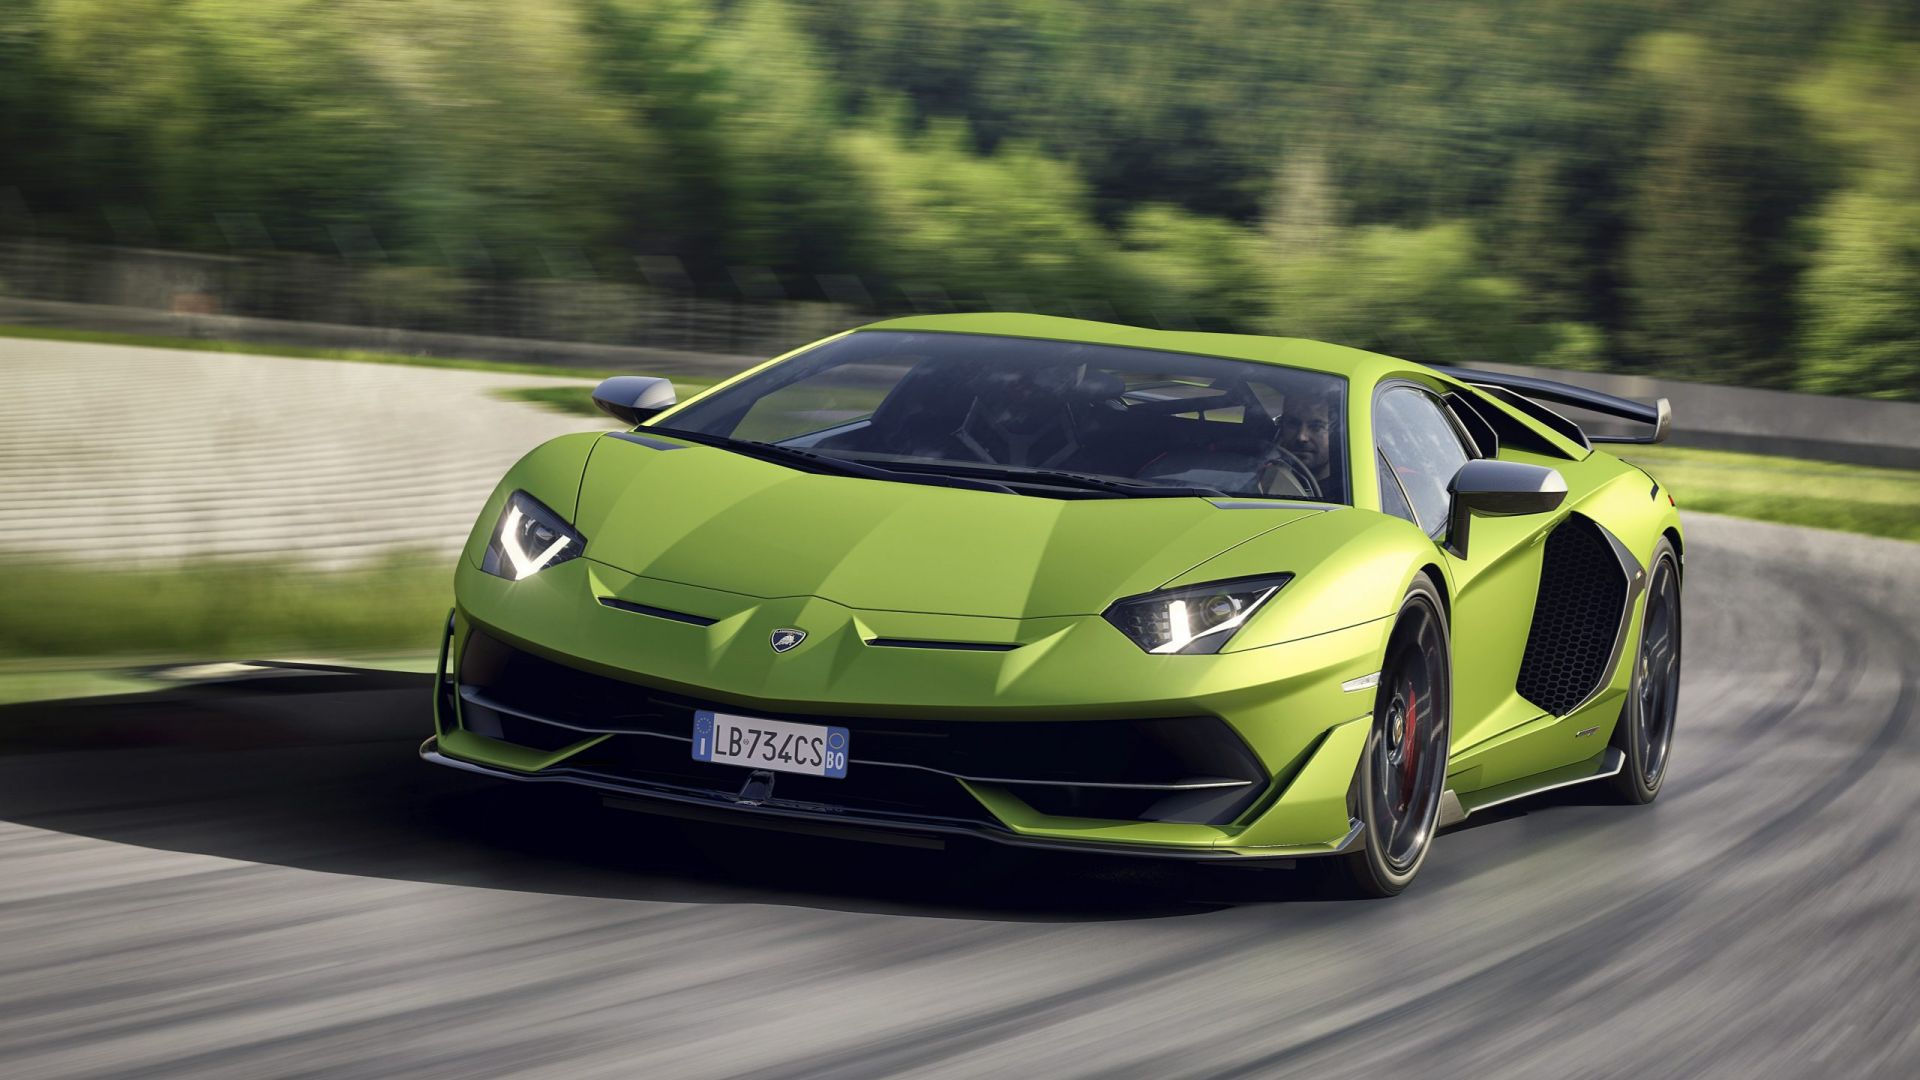 Wallpaper Lamborghini Aventador Svj 2019 Cars Supercar Hd